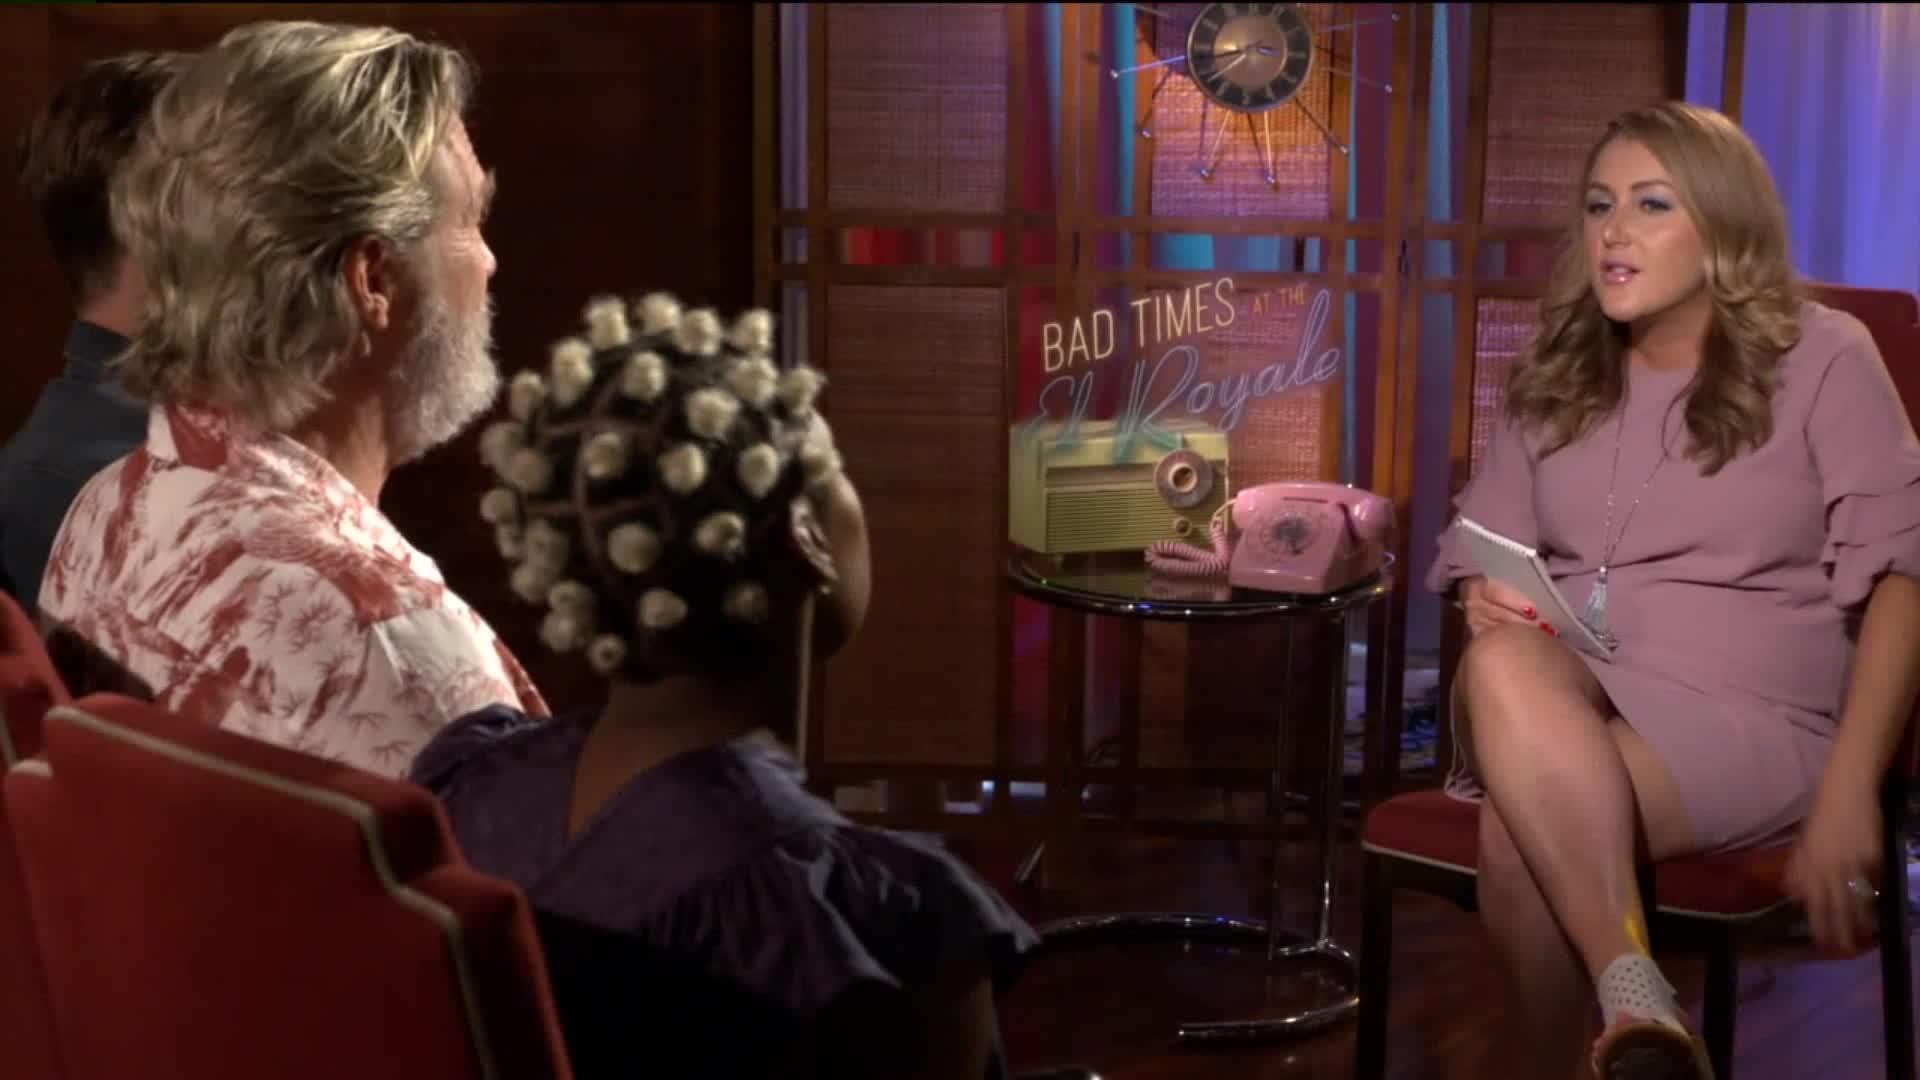 Bad Times At The El Royale Cast Interviews Fox31 Denver